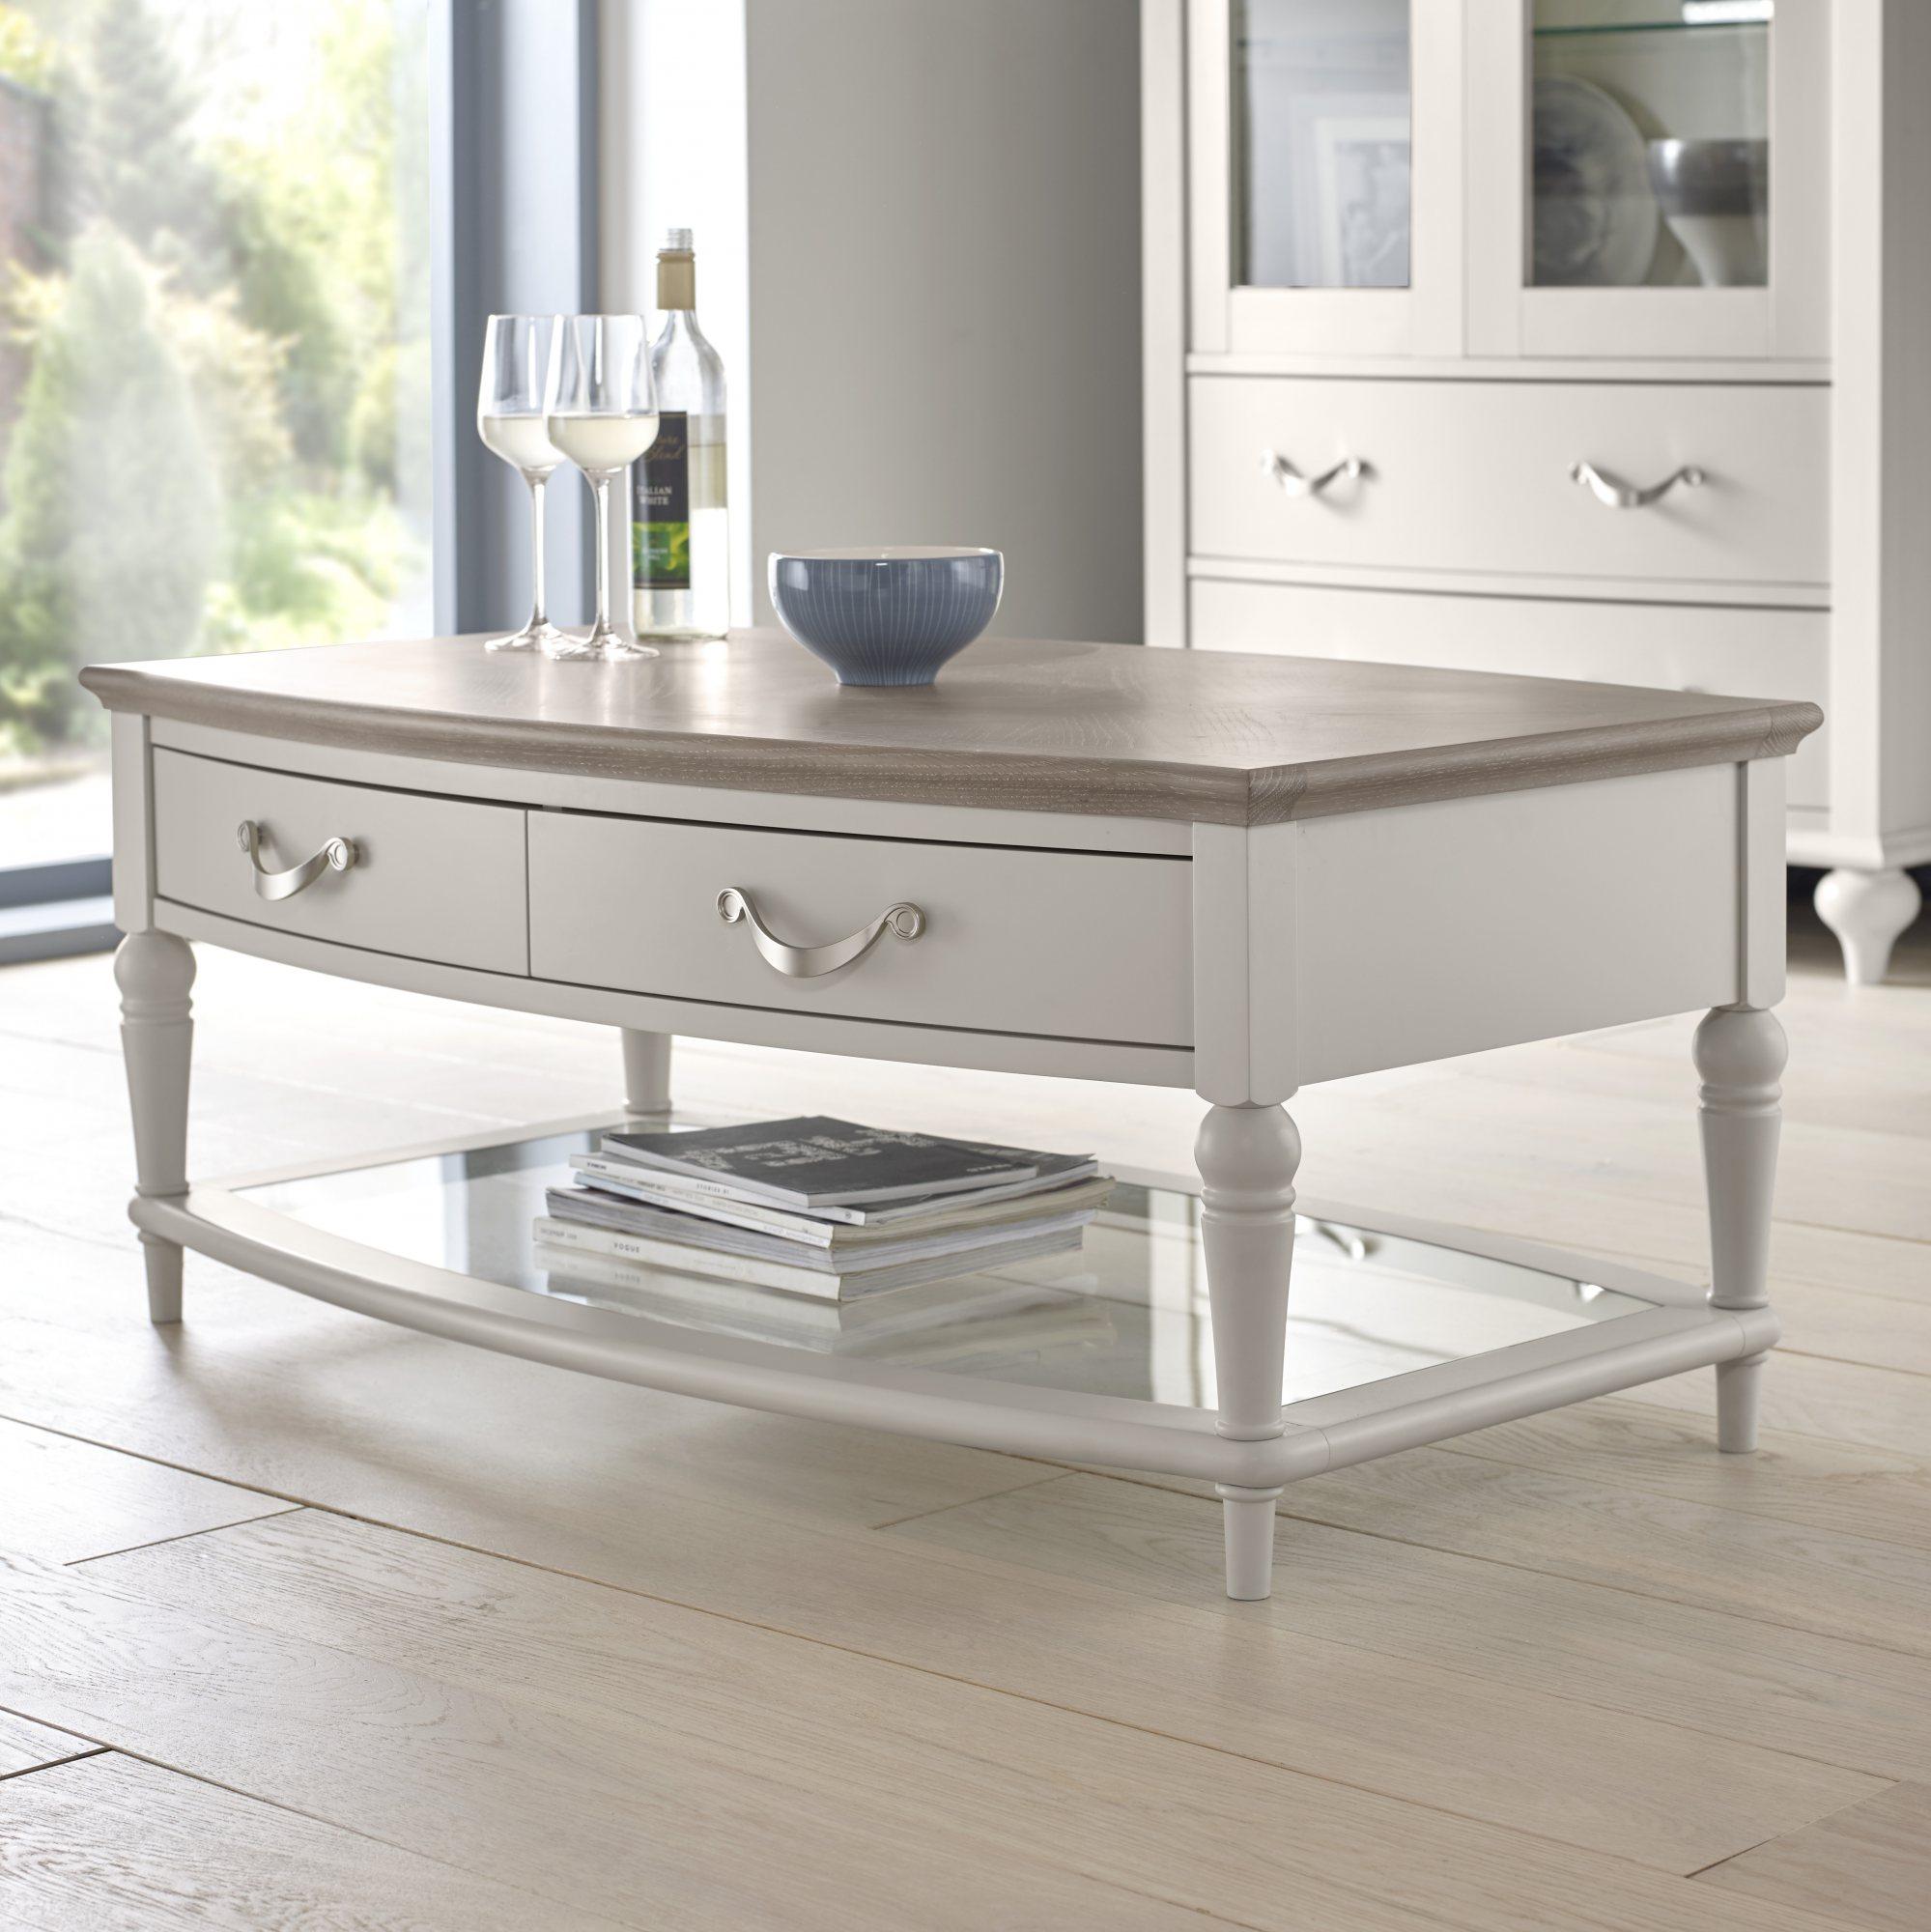 MONICA GREY COFEE TABLE - L108cm x D64cm x H46cm